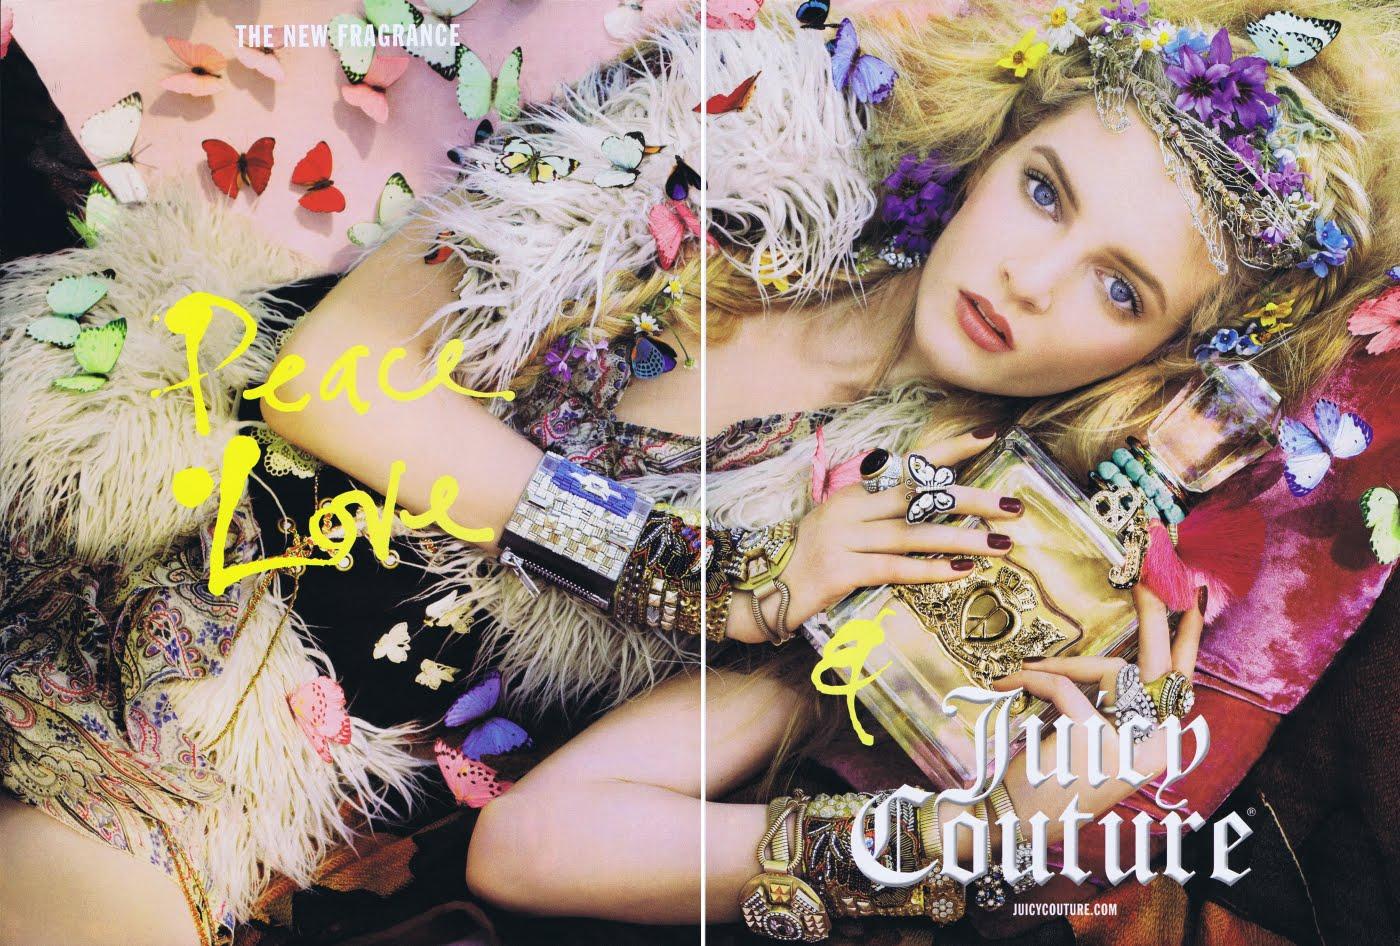 http://1.bp.blogspot.com/-xeWeH-utVZM/Tg-3cpWZmEI/AAAAAAAADw8/V0ONW9cH1sM/s1600/Juicy+Couture-1.jpg